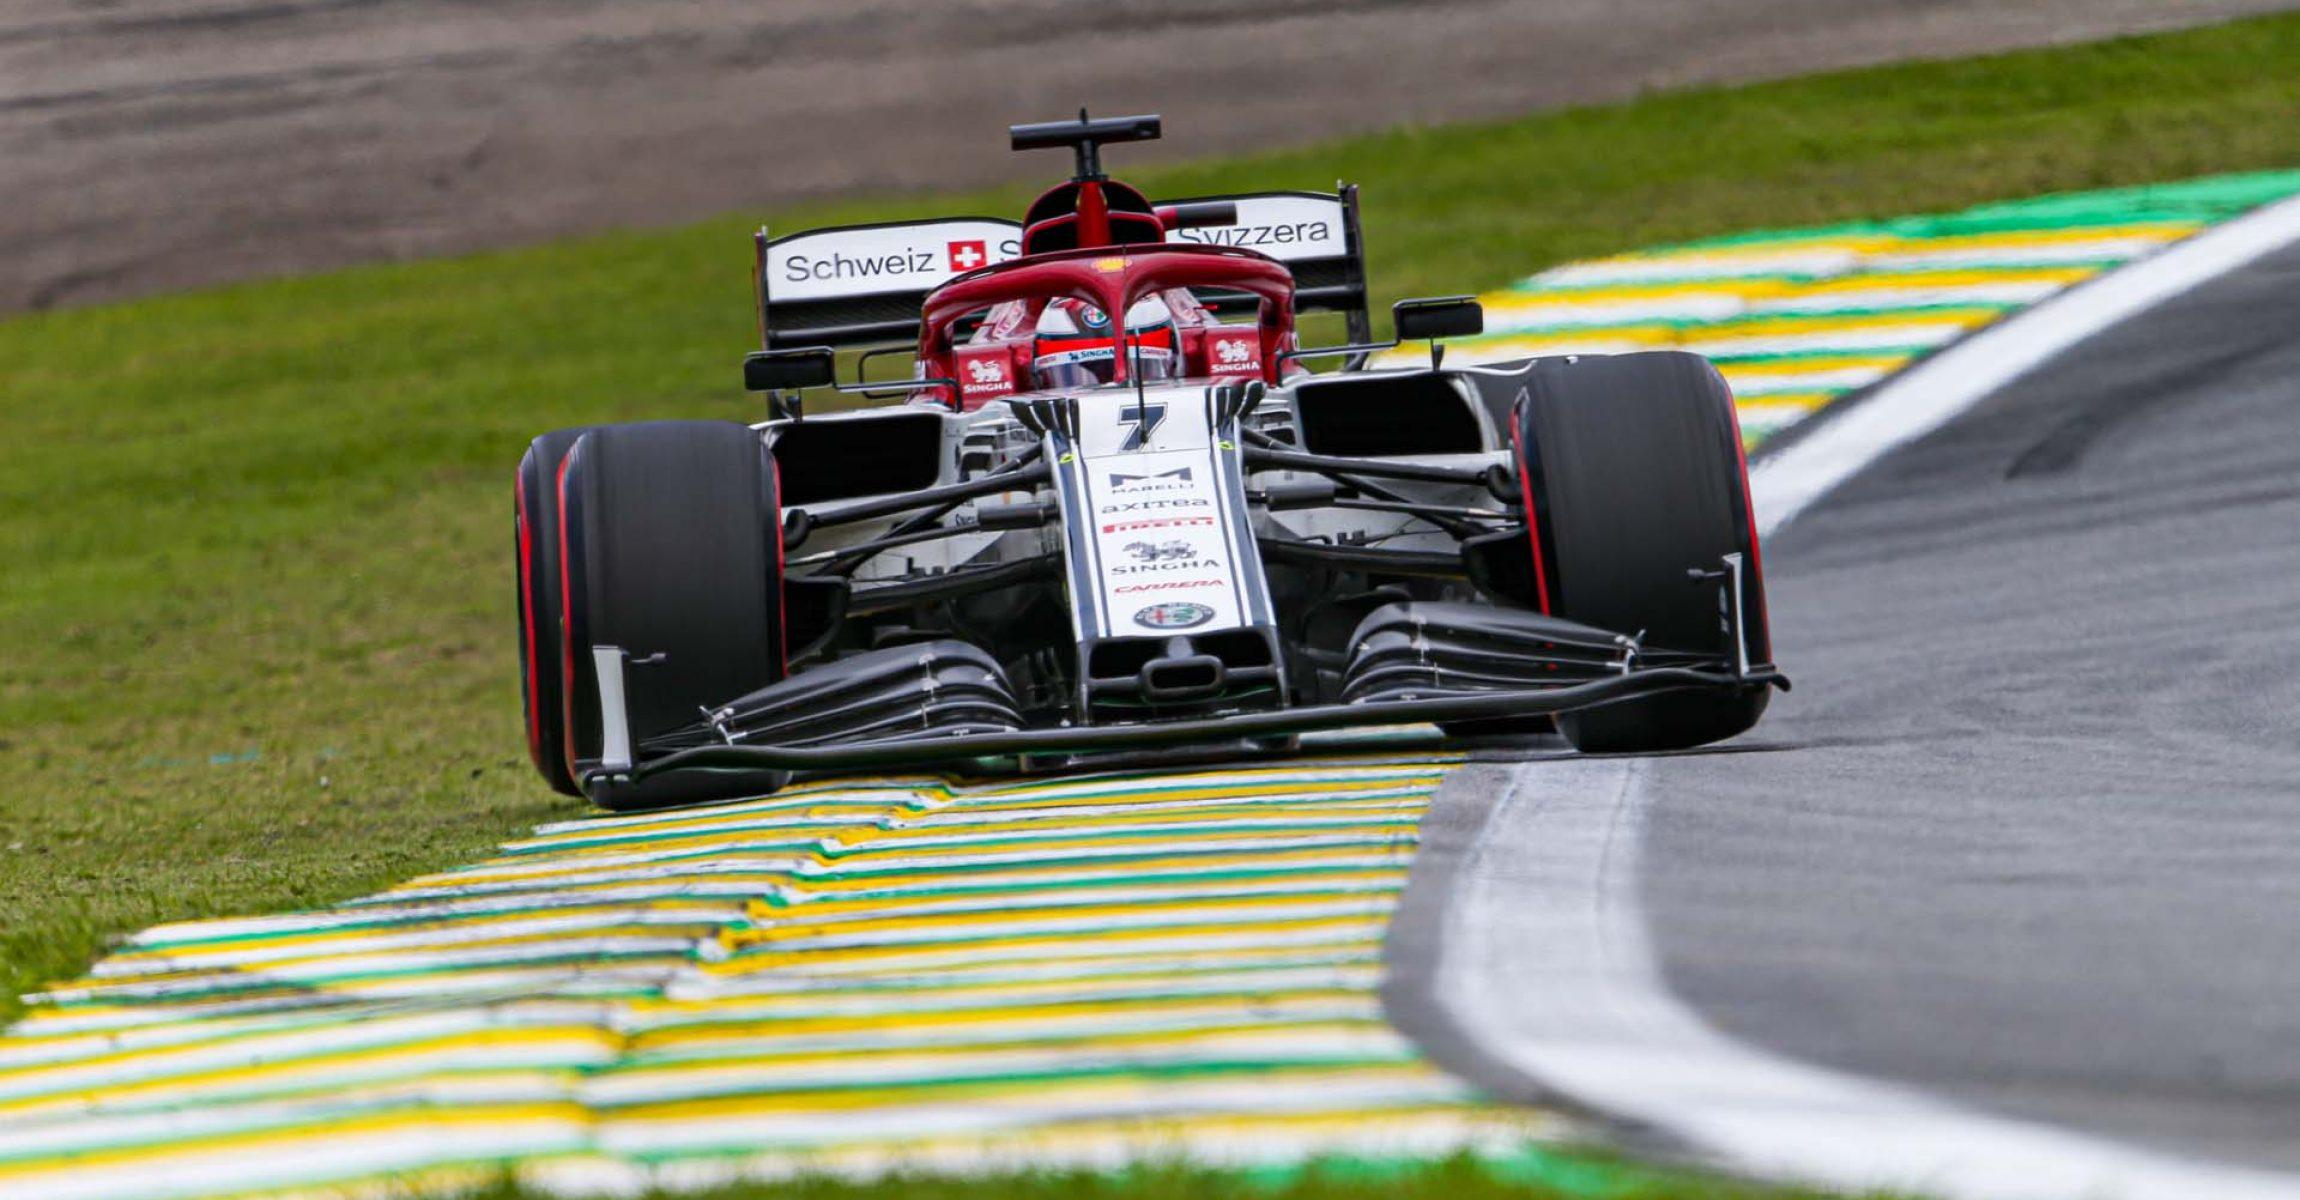 07 RAIKKONEN Kimi Räikkönen (fin), Alfa Romeo Racing C38, action during the 2019 Formula One World Championship, Brazil Grand Prix from November 15 to 17 in Sao Paulo, Brazil - Photo Antonin Vincent / DPPI